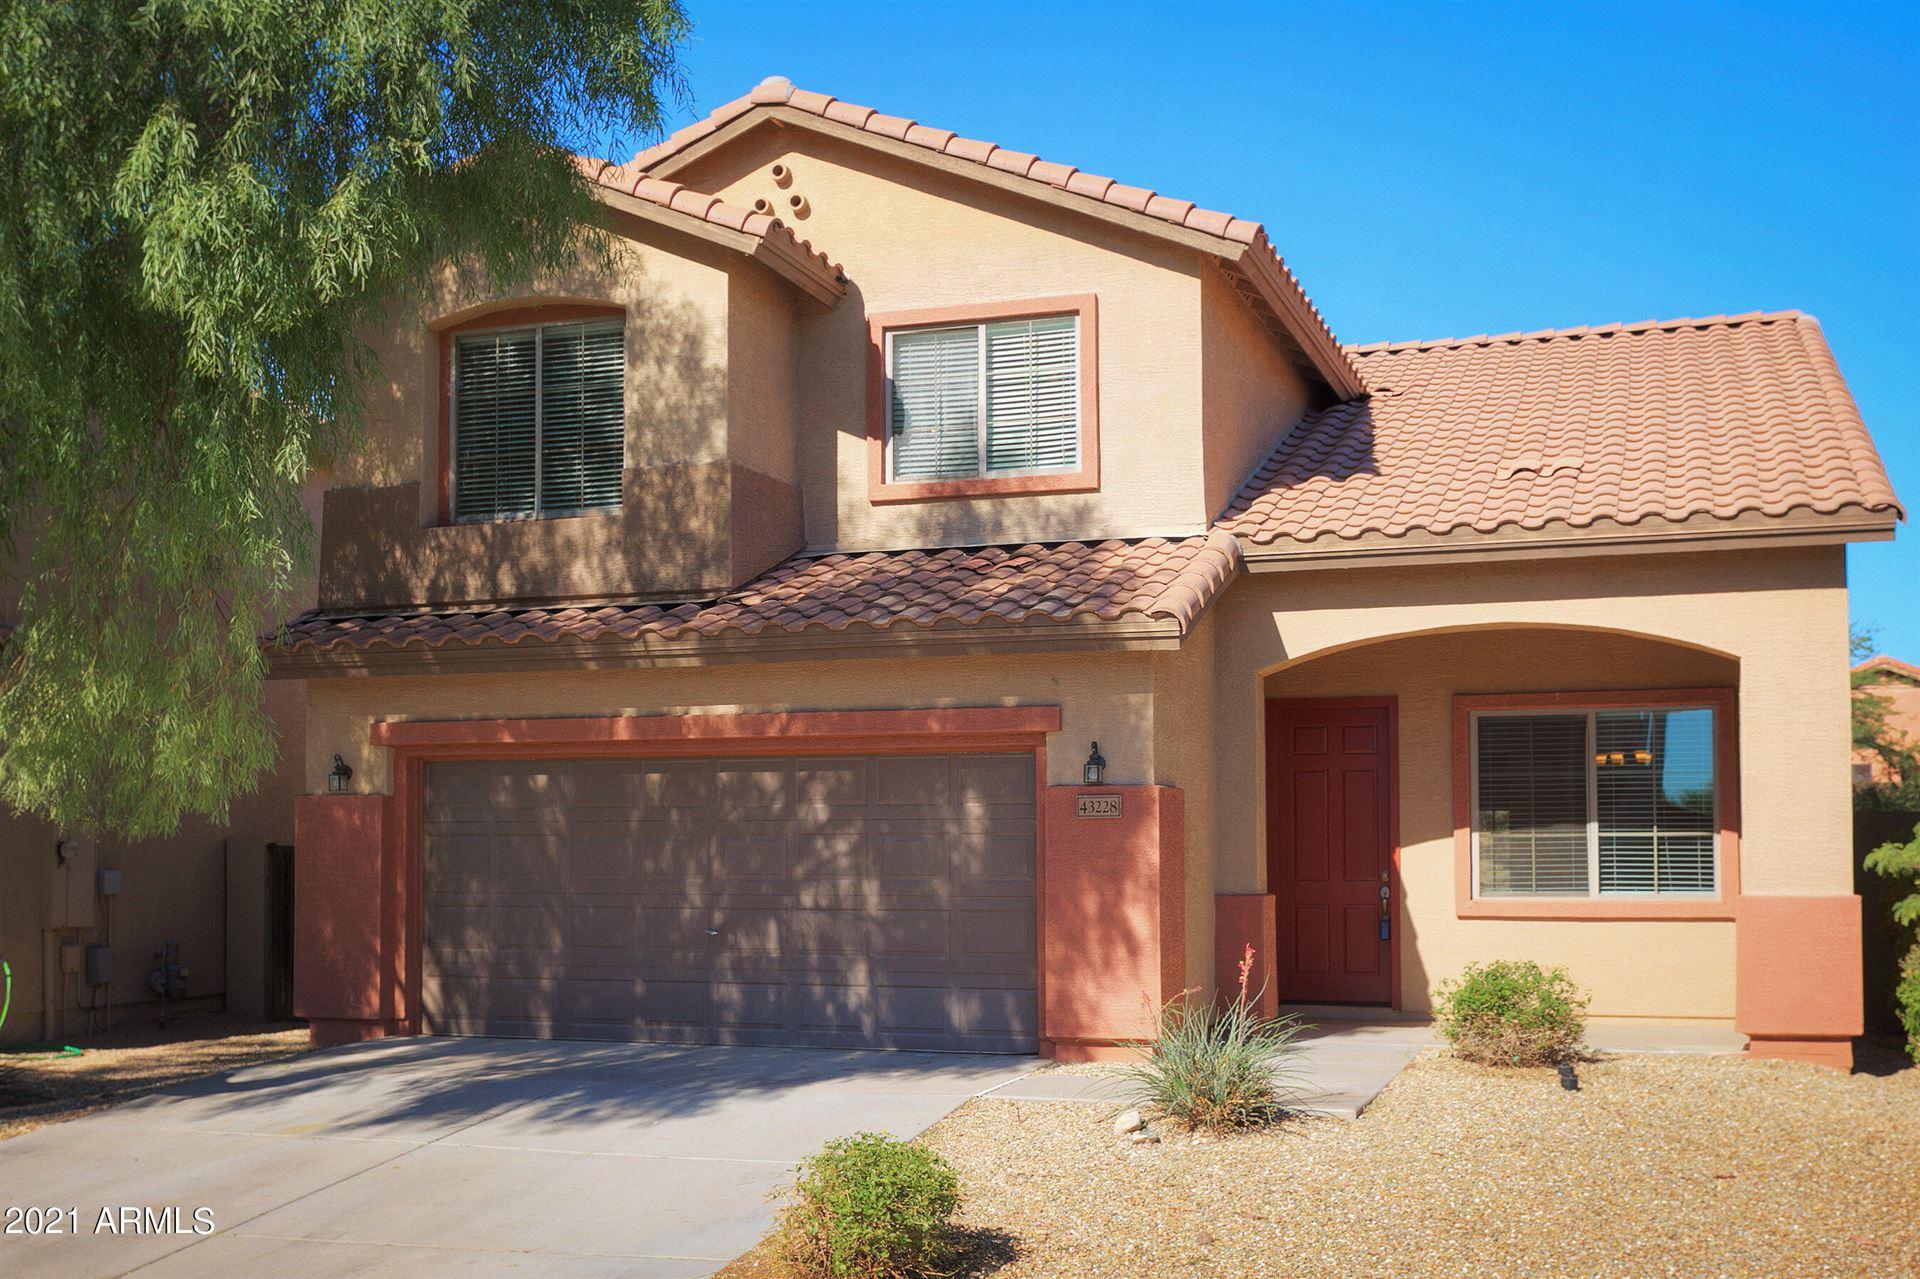 Photo of 43228 N VISTA HILLS Drive, Anthem, AZ 85086 (MLS # 6303361)